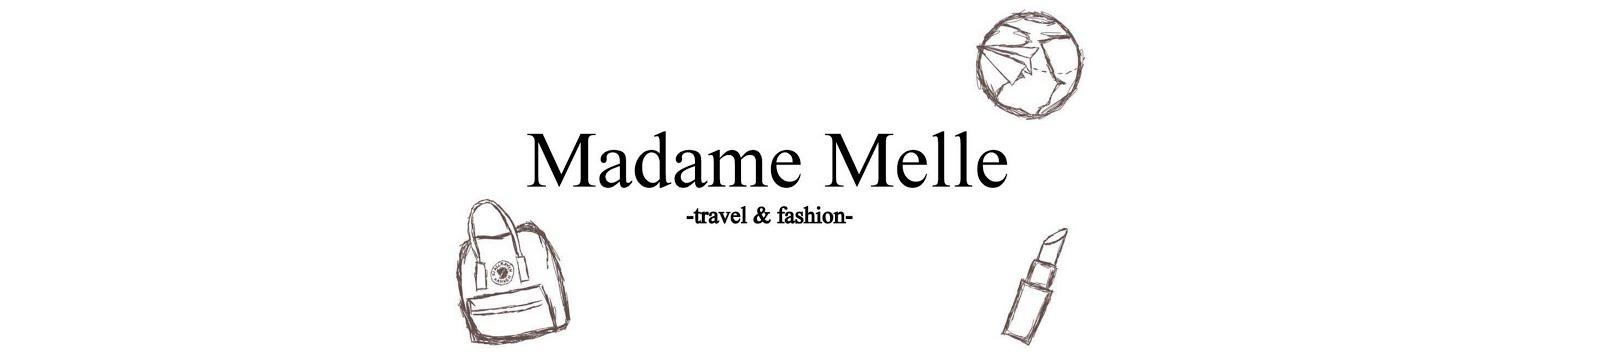 Madame Melle